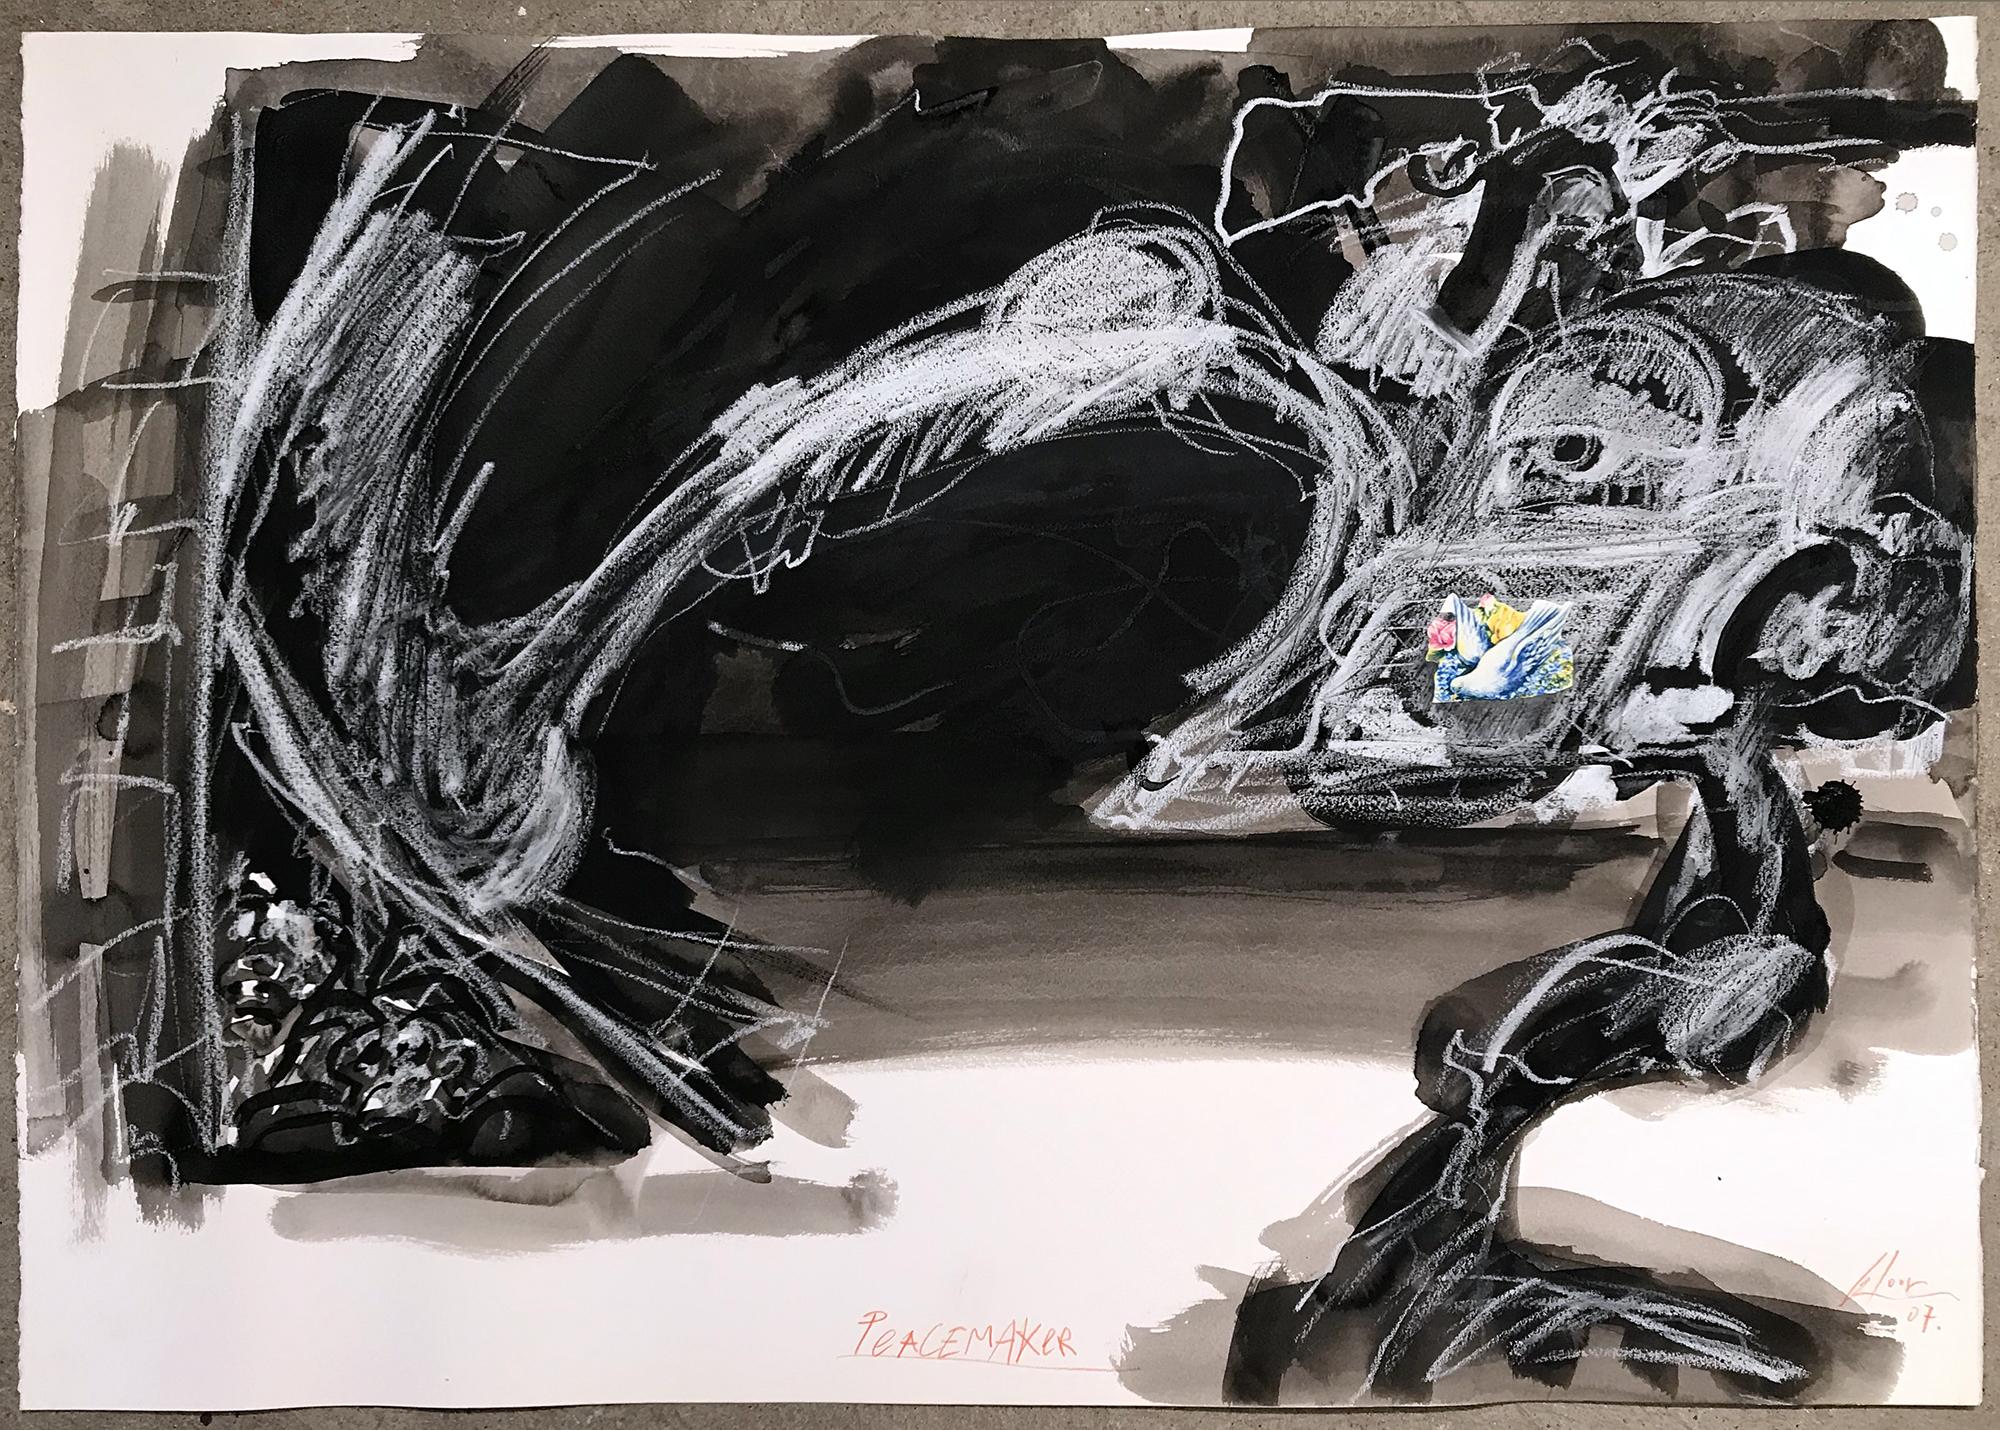 Peacemaker, 2007, Mischtechnik auf Büttenpapier, ca. 70 x 50, ohne Rahmen